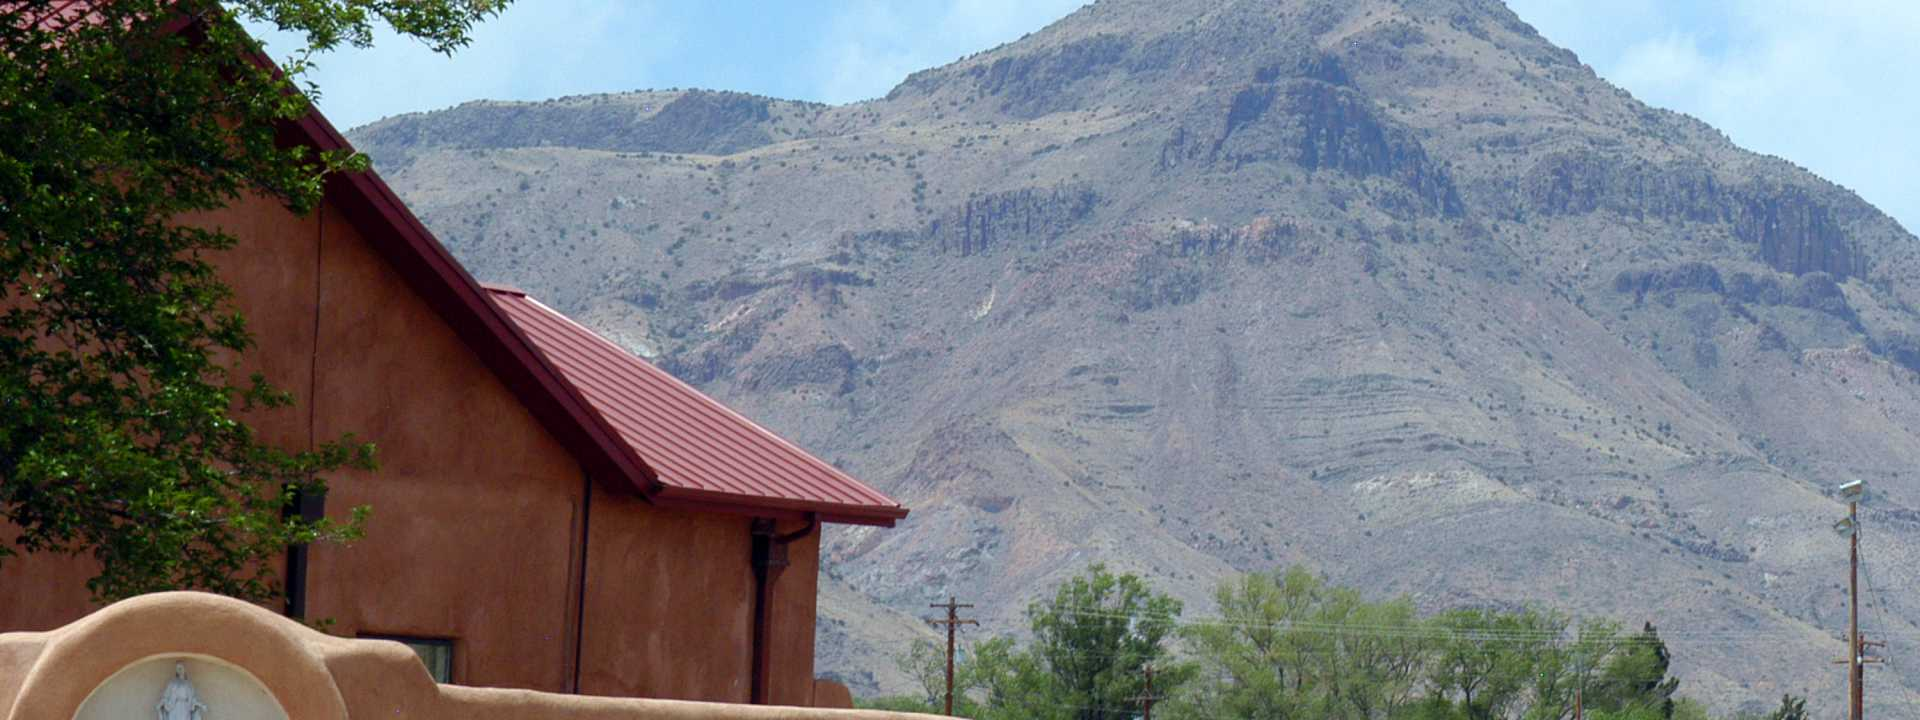 Socorro Historic District Byway Header